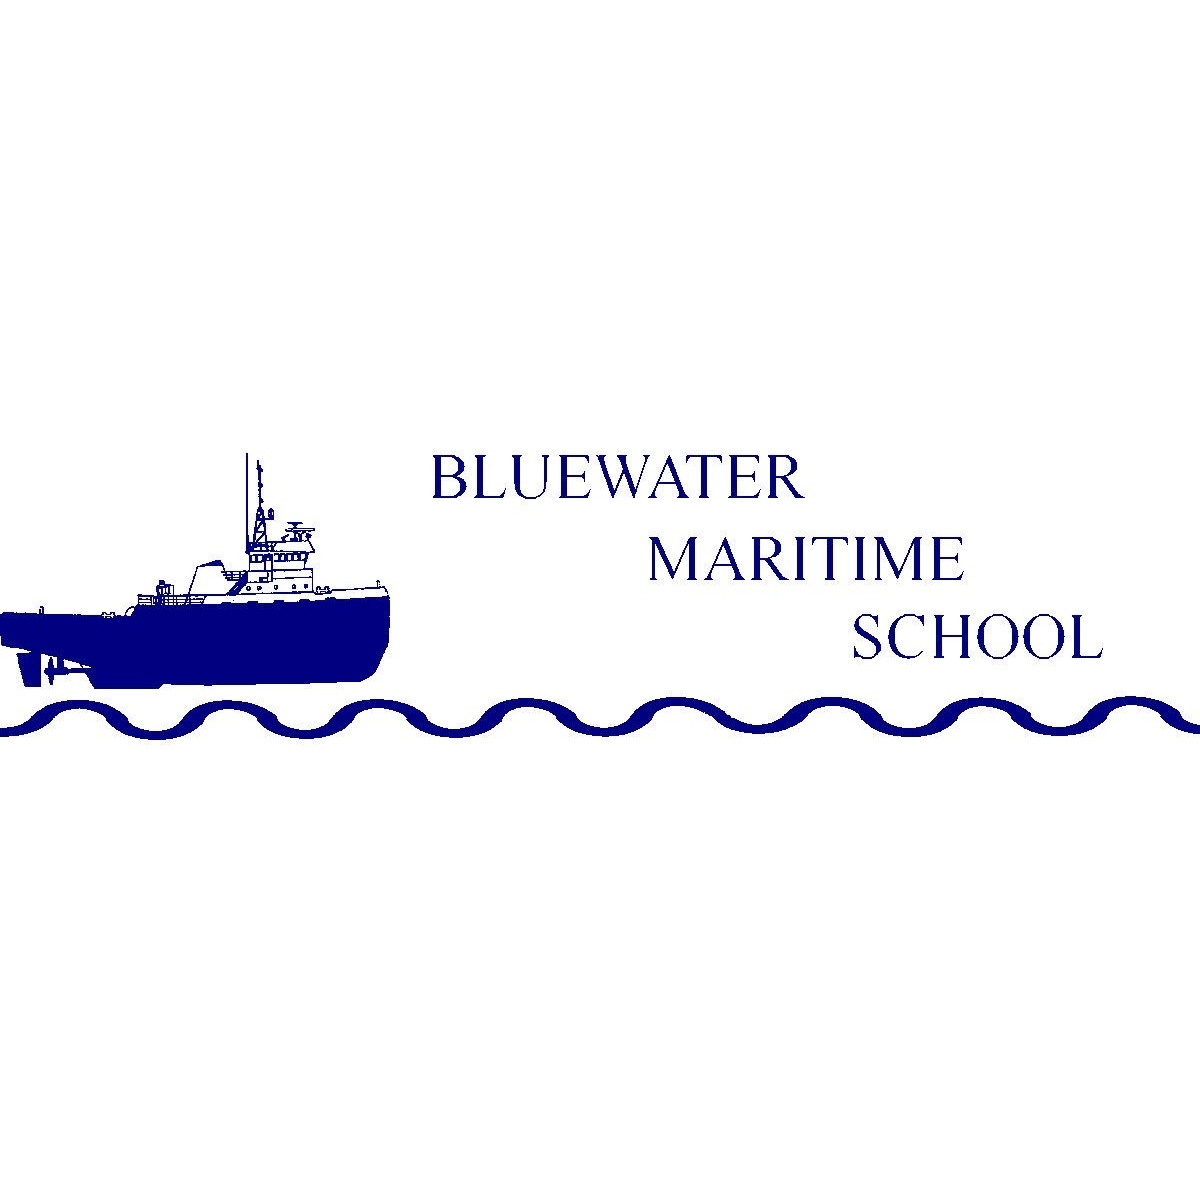 BLUEWATER MARITIME SCHOOL - Jacksonville, FL - Vocational Schools